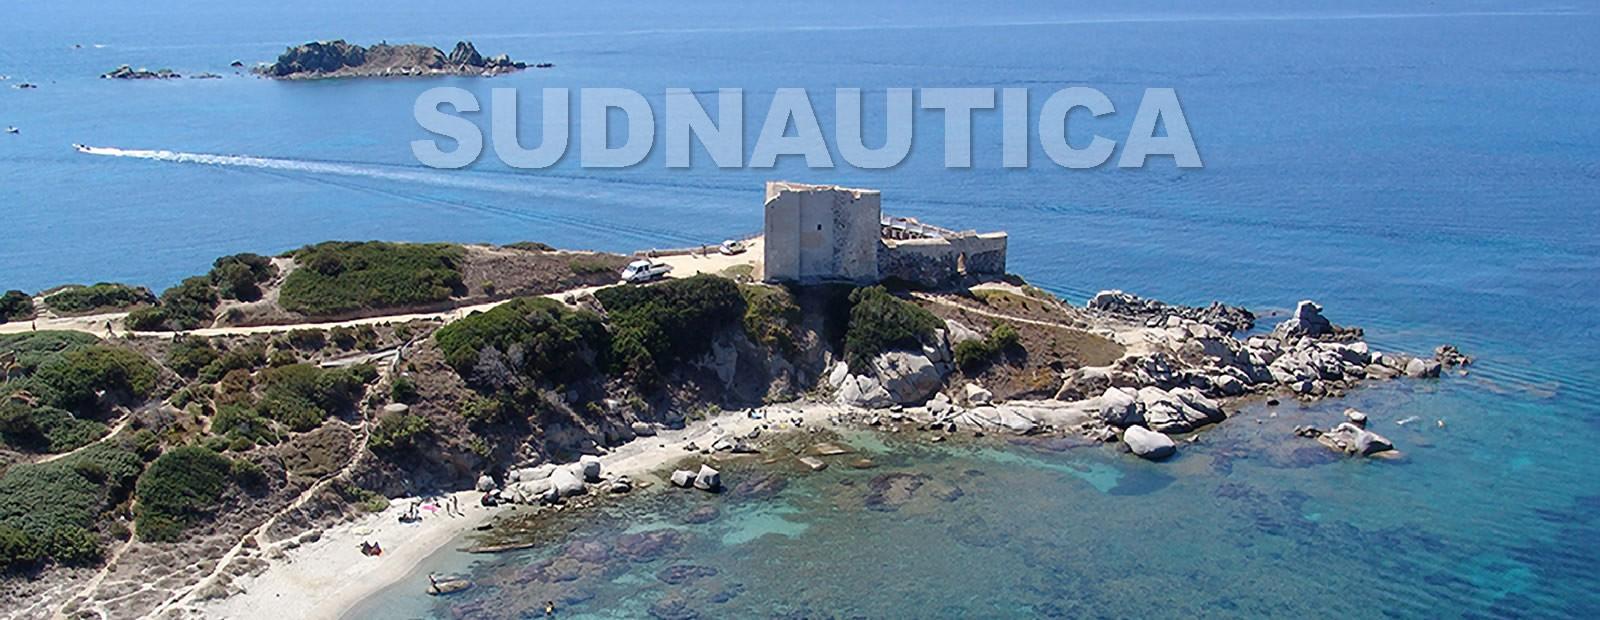 sudnautica2